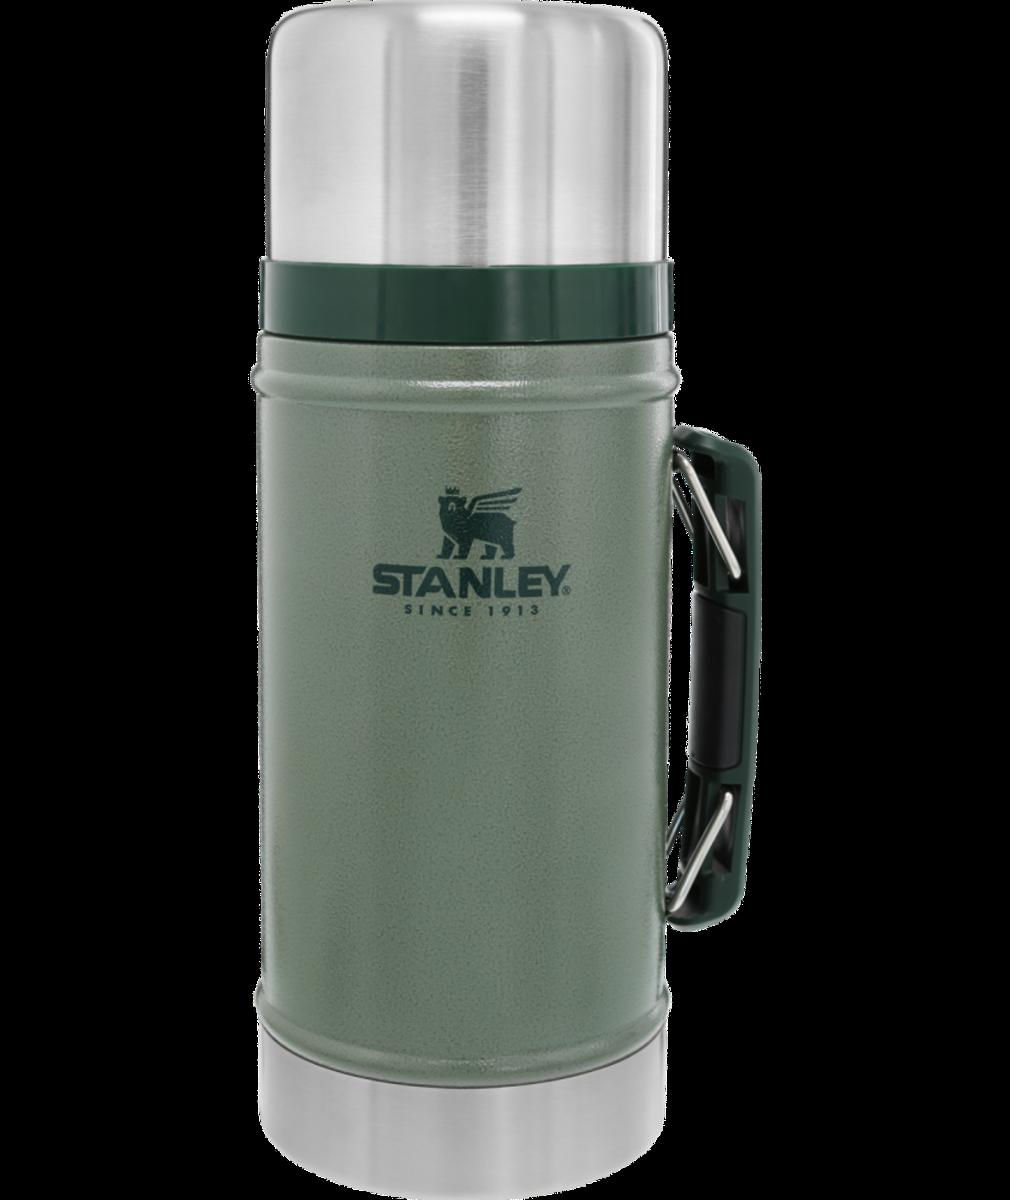 STANLEY CLASSIC FOOD JAR 0.9